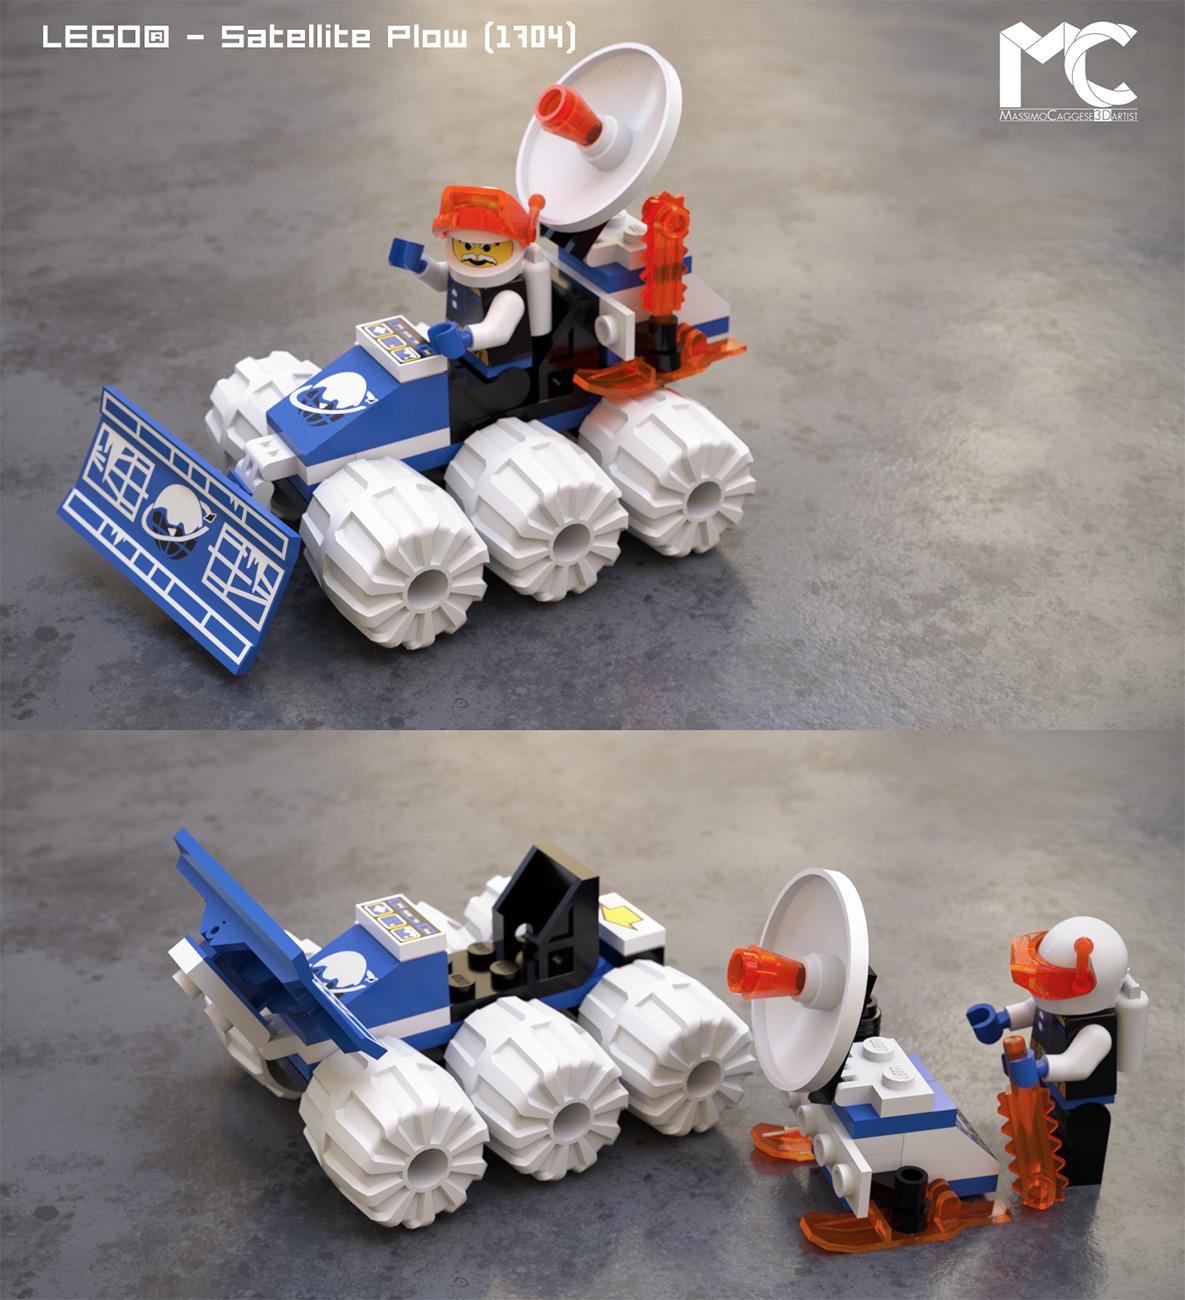 LEGO - Satellite Plow (Octane Render).